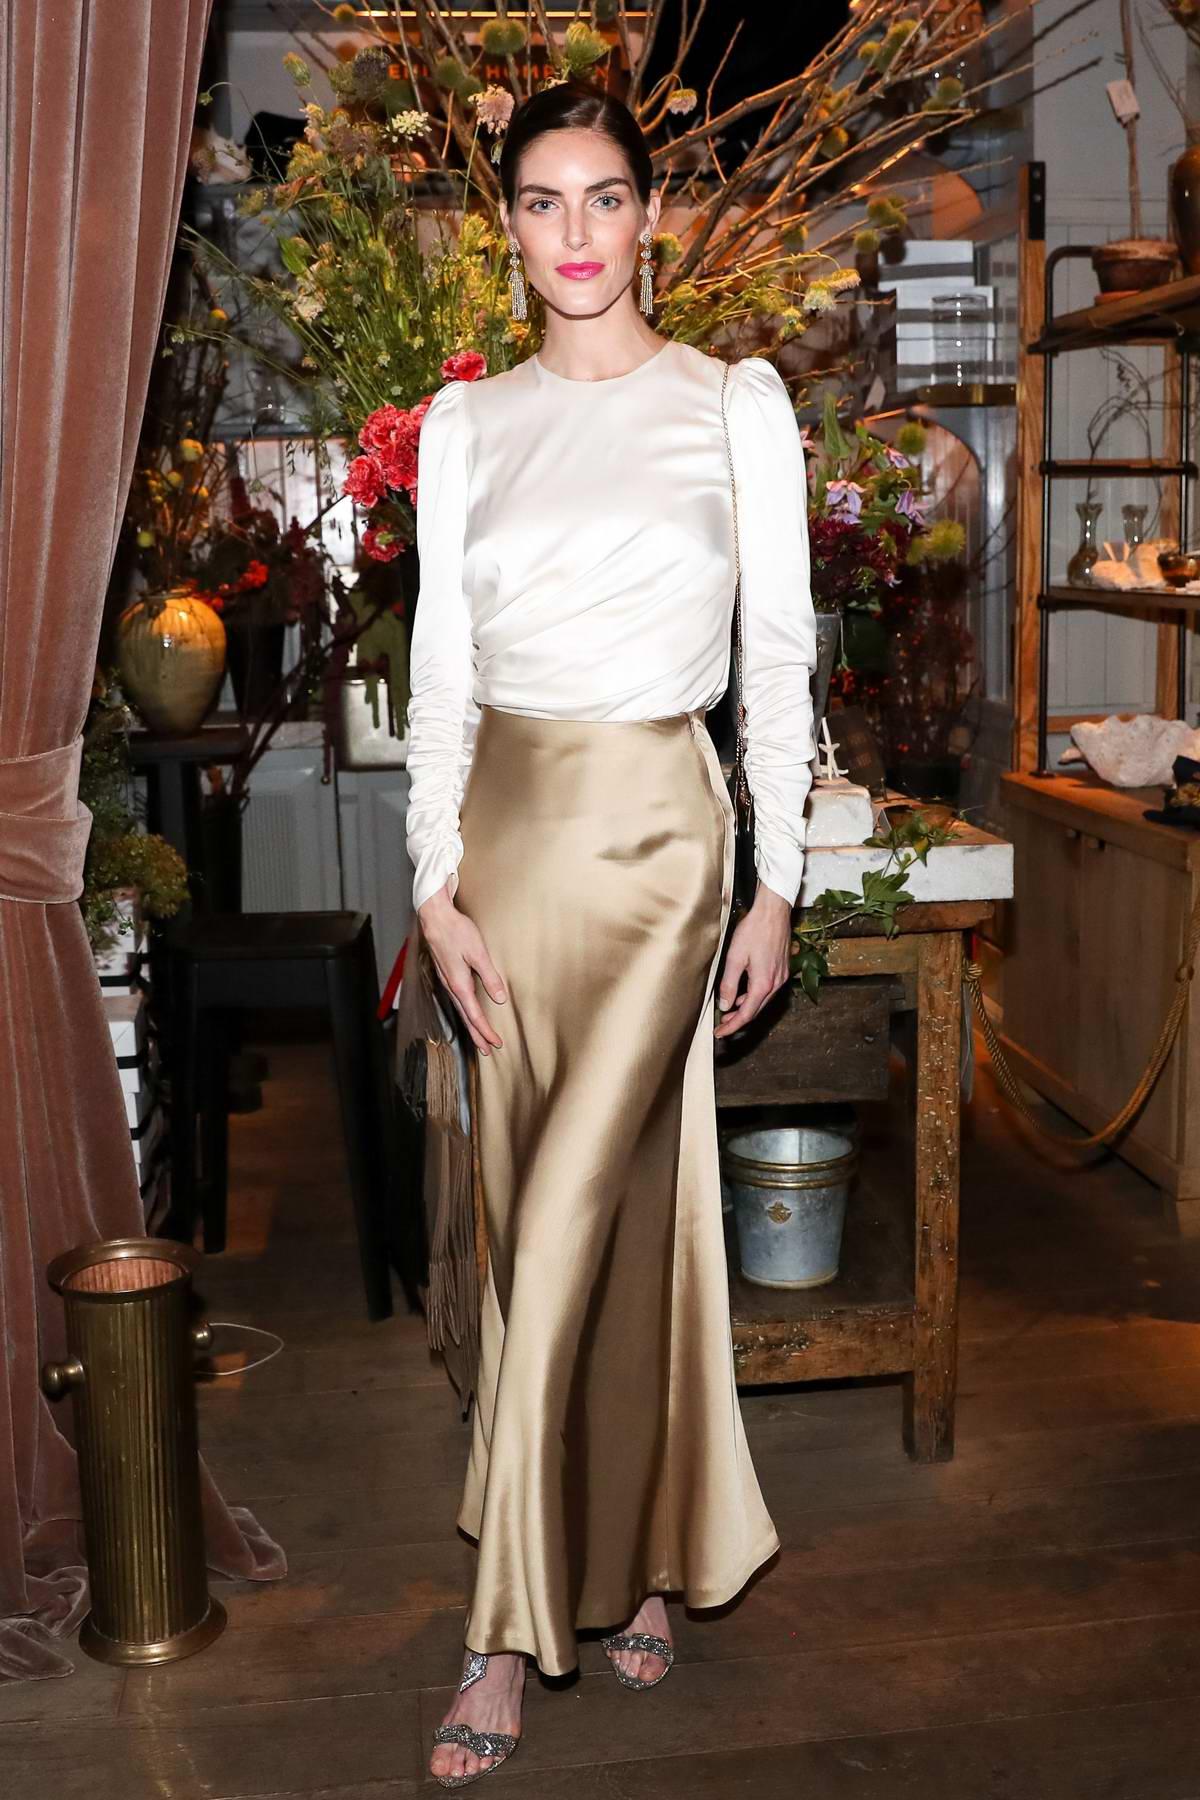 Hilary Rhoda attends Zimmermann Celebrates Spring 2019 Pre-Show Dinner in New York City